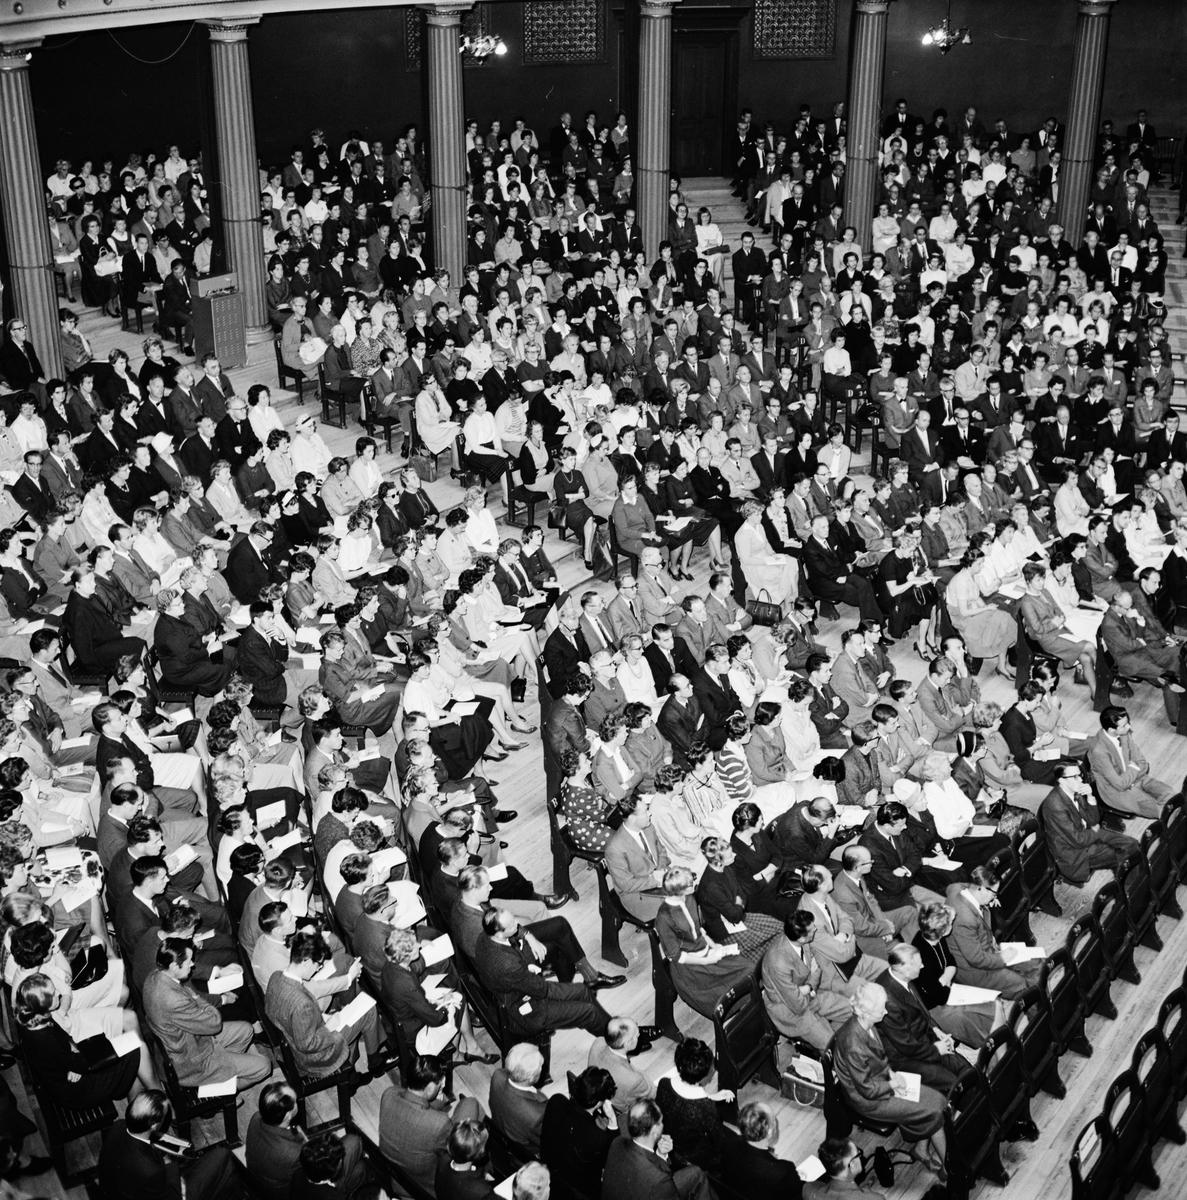 Lärare i Universitetsaulan, Uppsala 1962